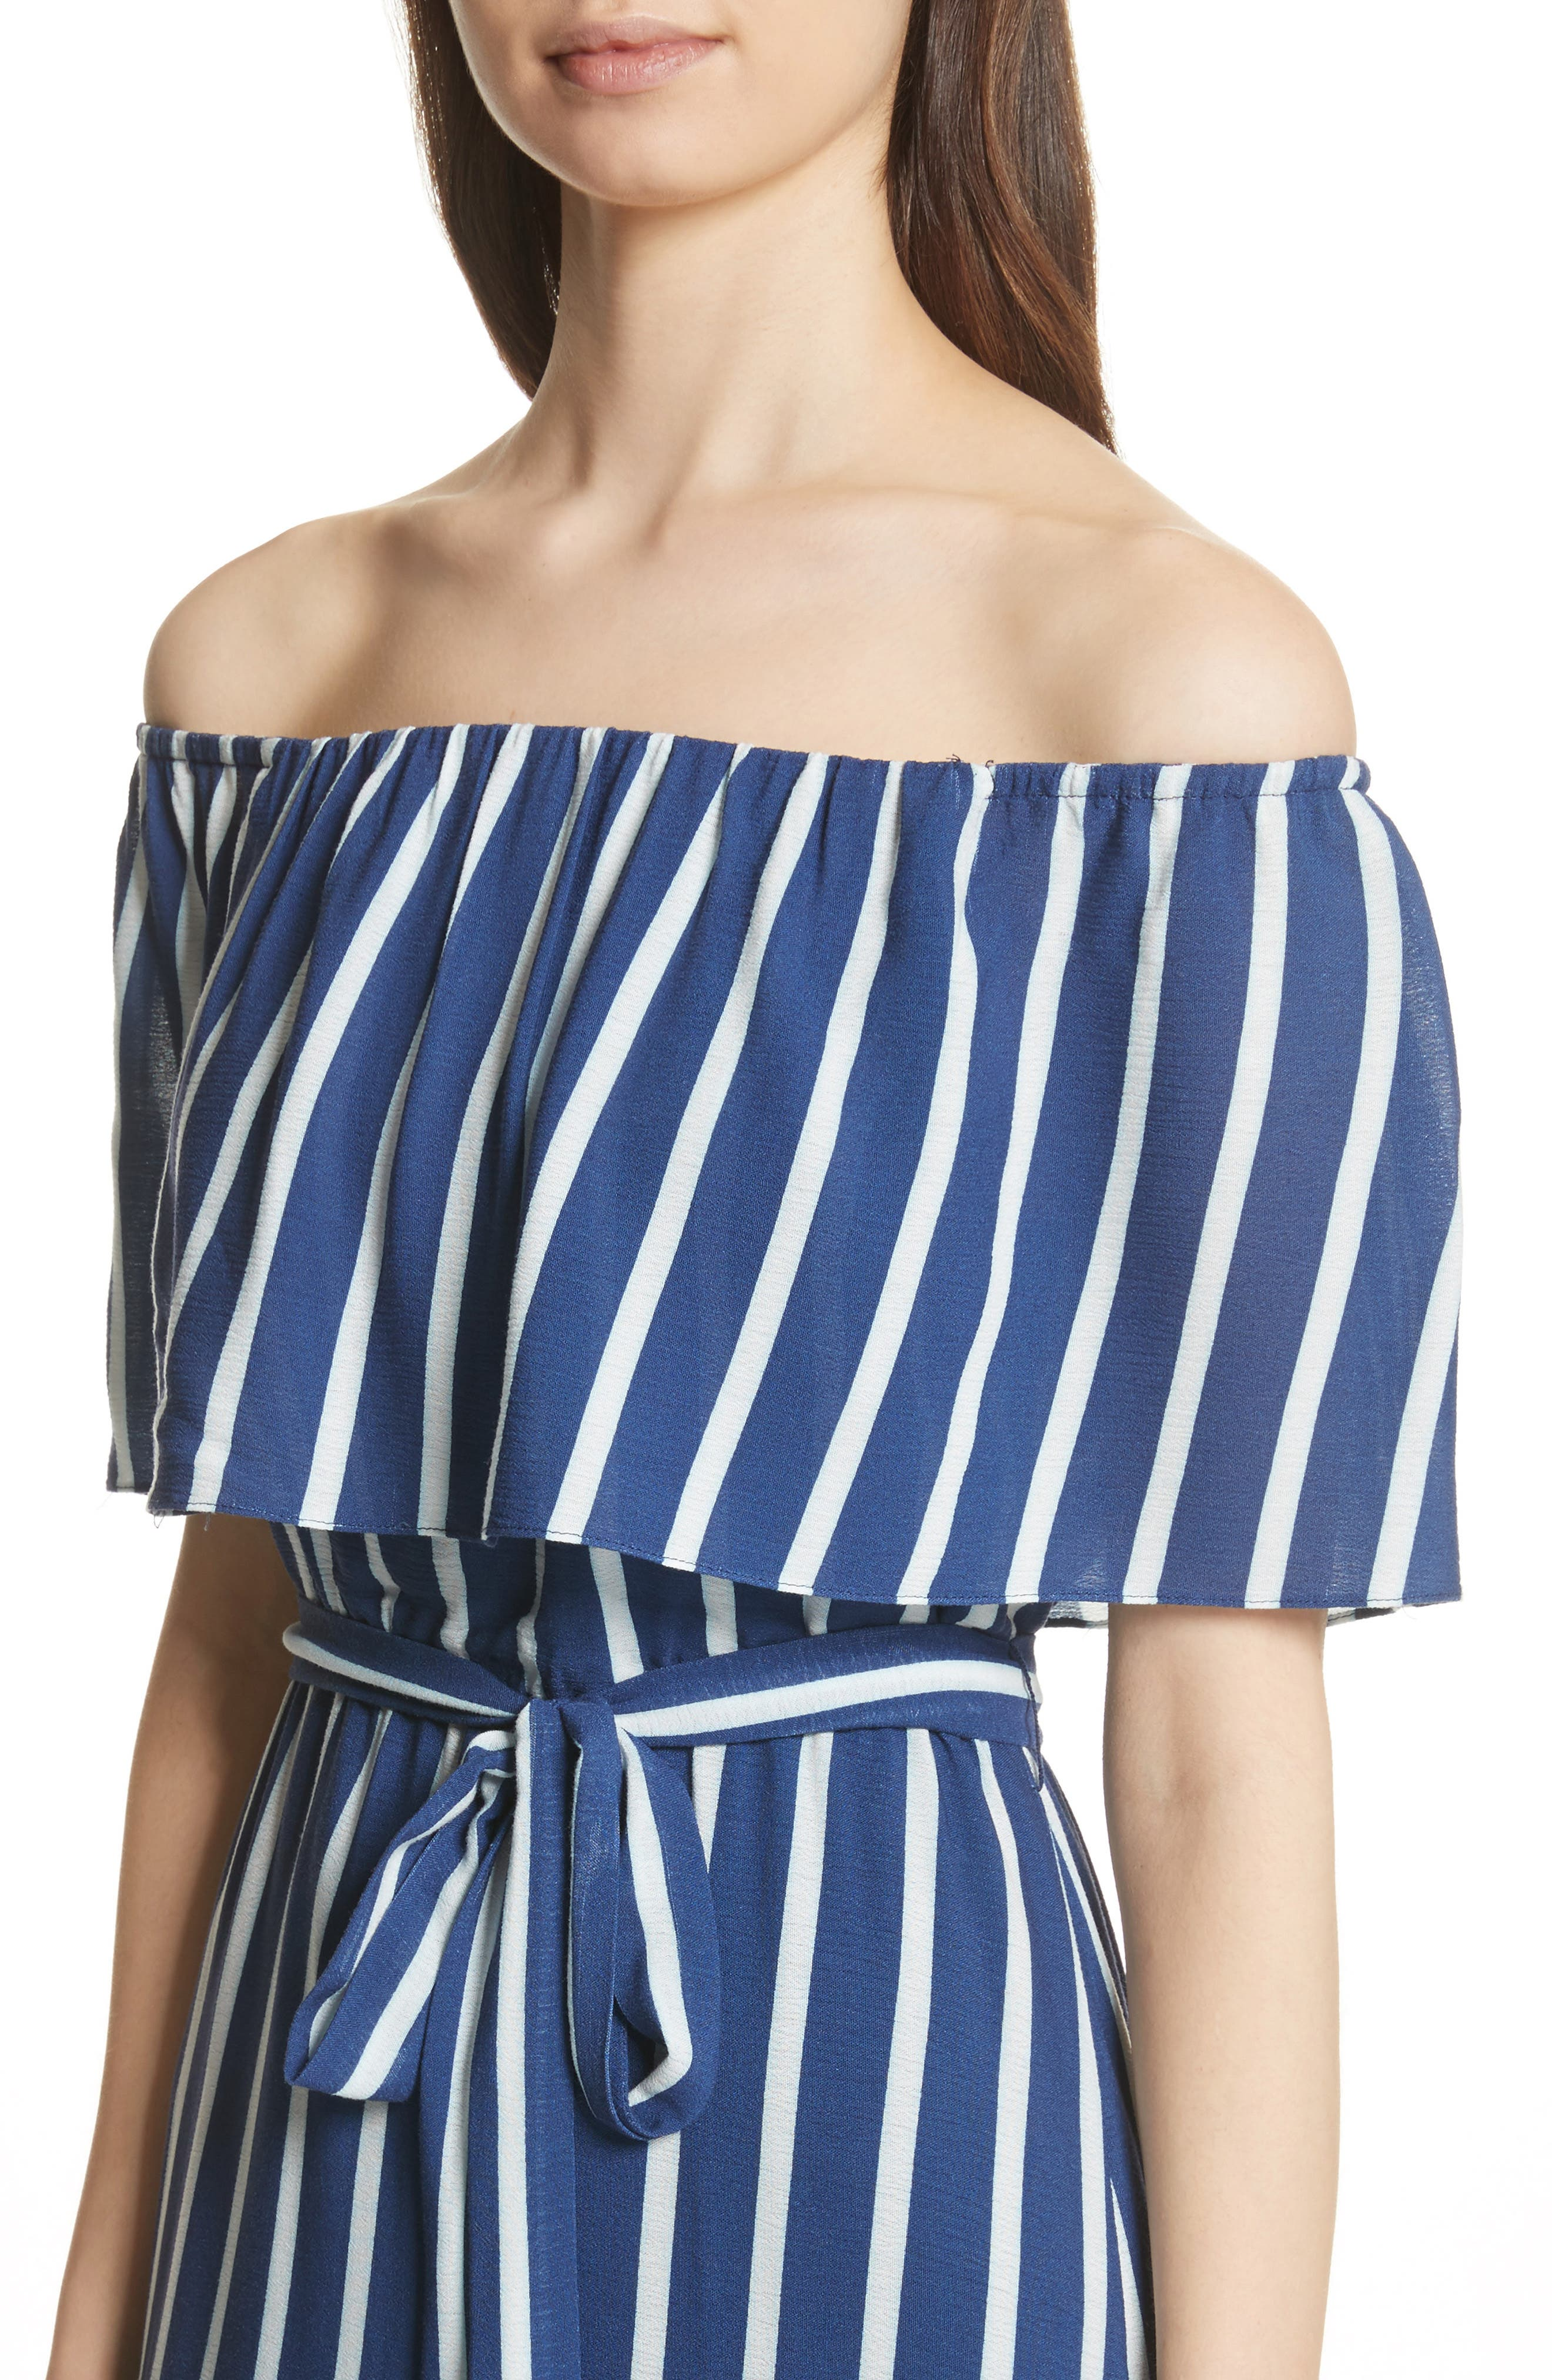 Grazi Off the Shoulder Maxi Dress,                             Alternate thumbnail 4, color,                             475